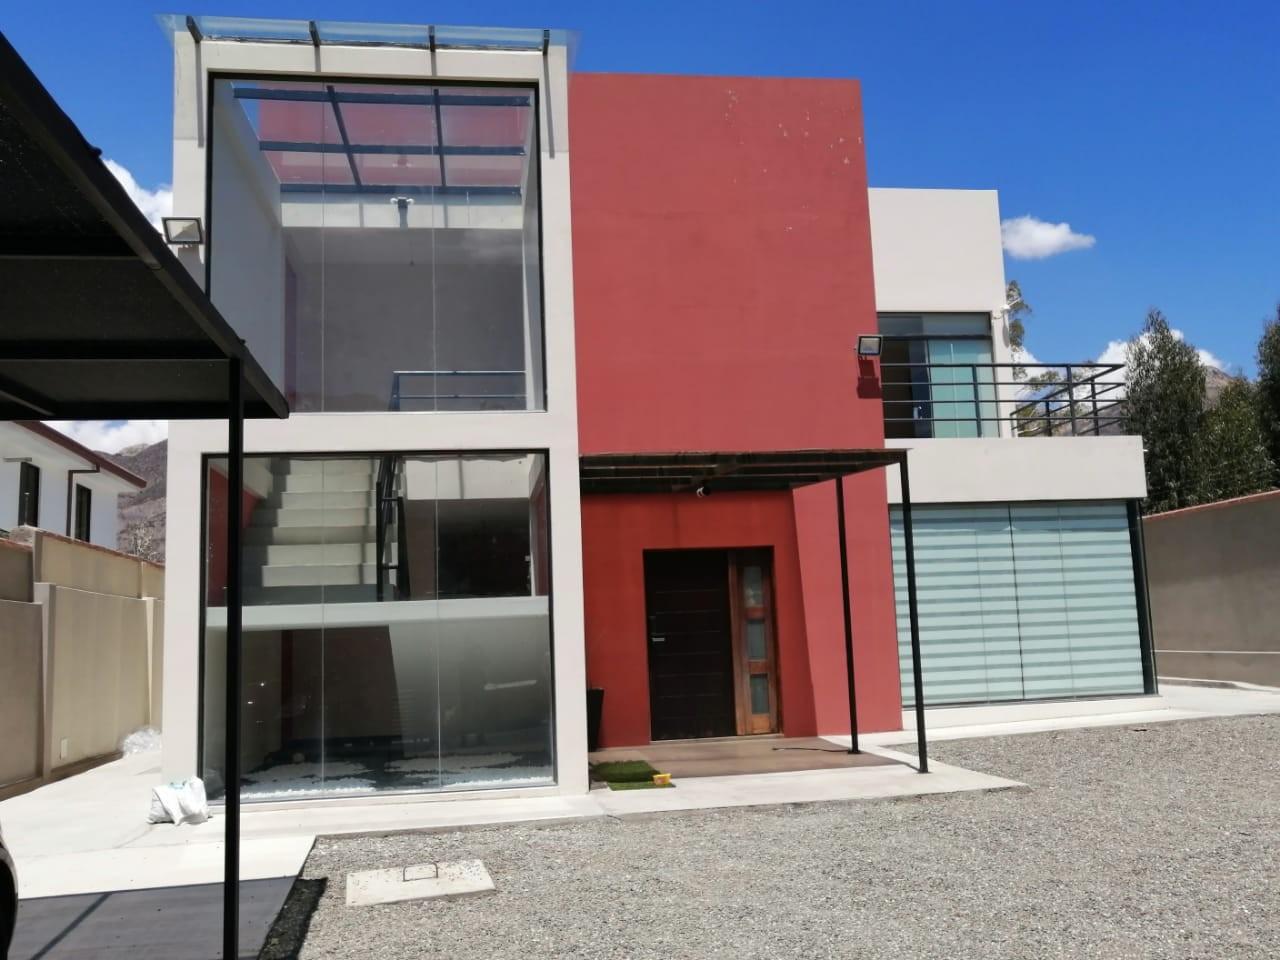 Casa en Venta $us.250.000.- LINDA CASA EN VENTA JUPAPINA 653 mtrs DE TERRENO LPZ Foto 19